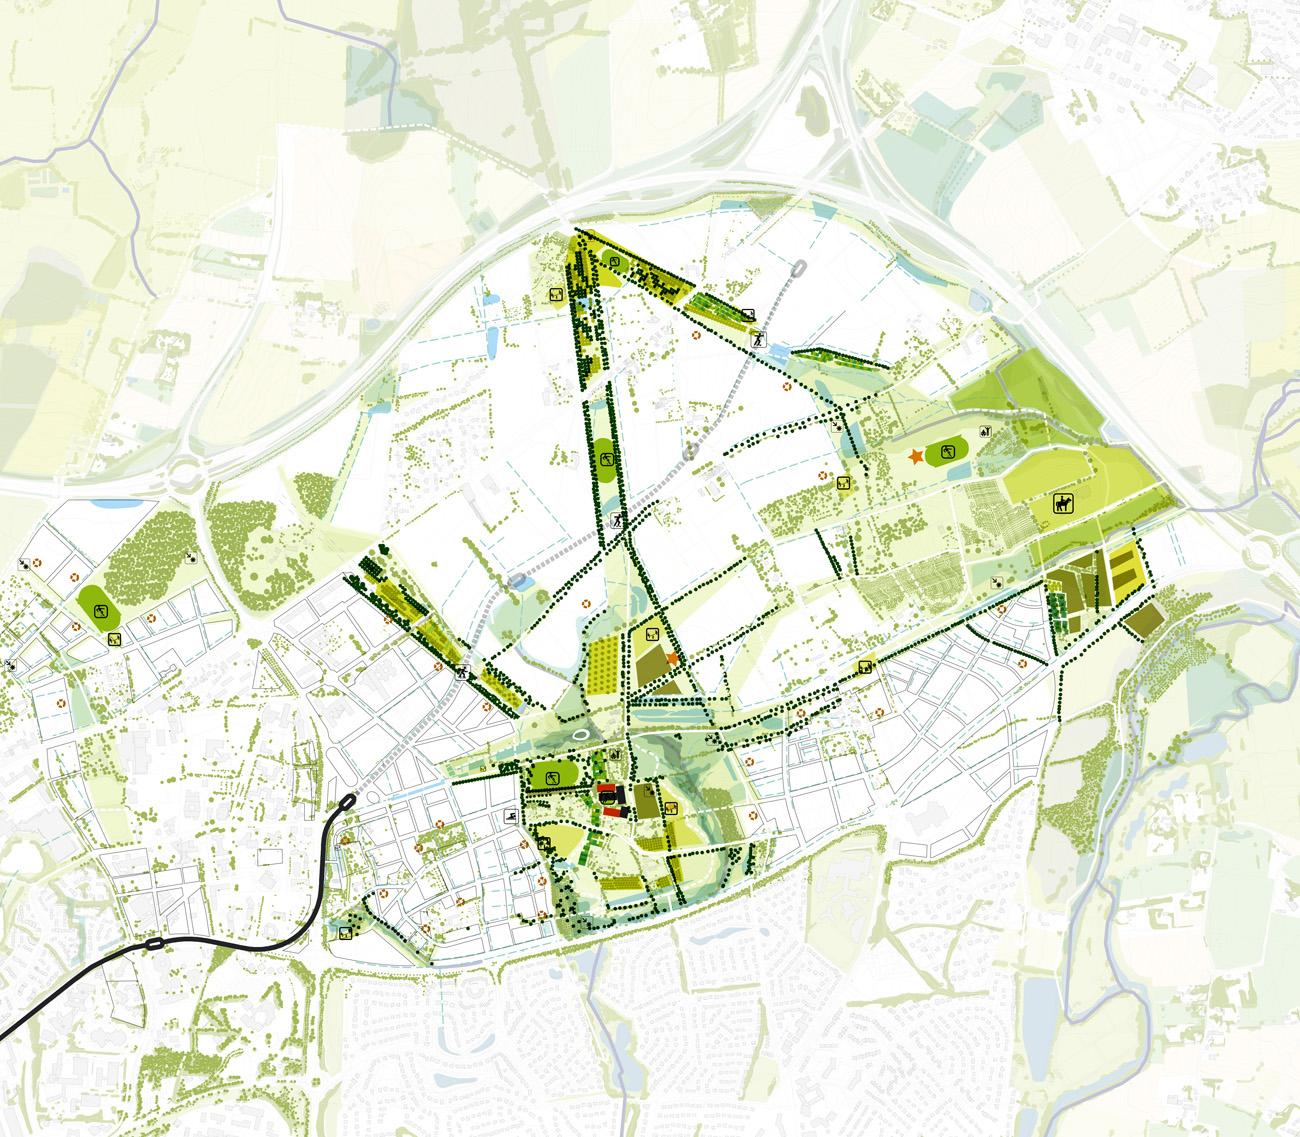 Viasilva - Les Parcs - Plan 2 © Devillers